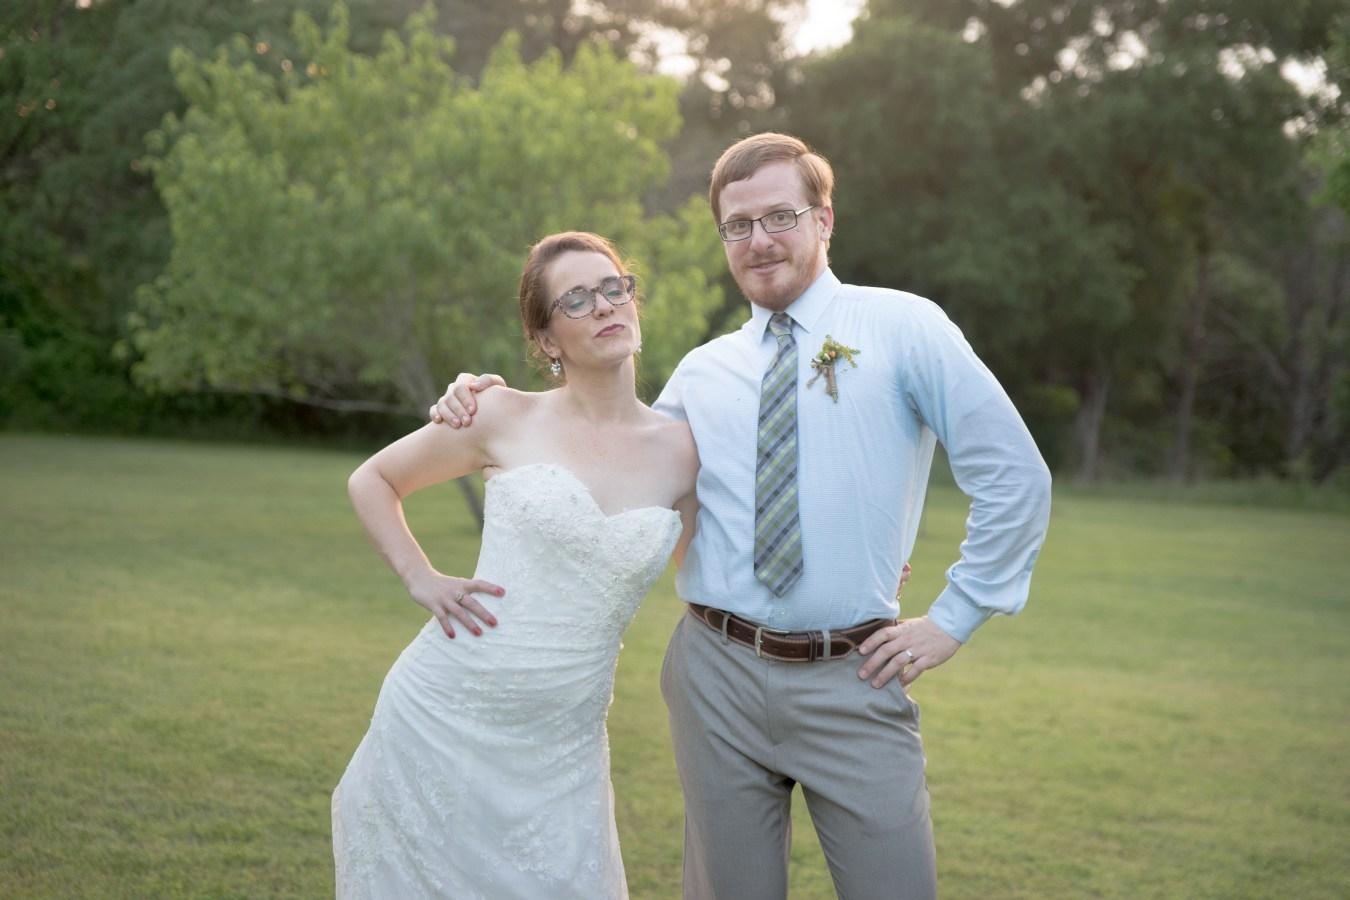 HighDot-Studios-Wedding-Cedar-Bend-Event-Center -Austin-Kim and Mike (60)